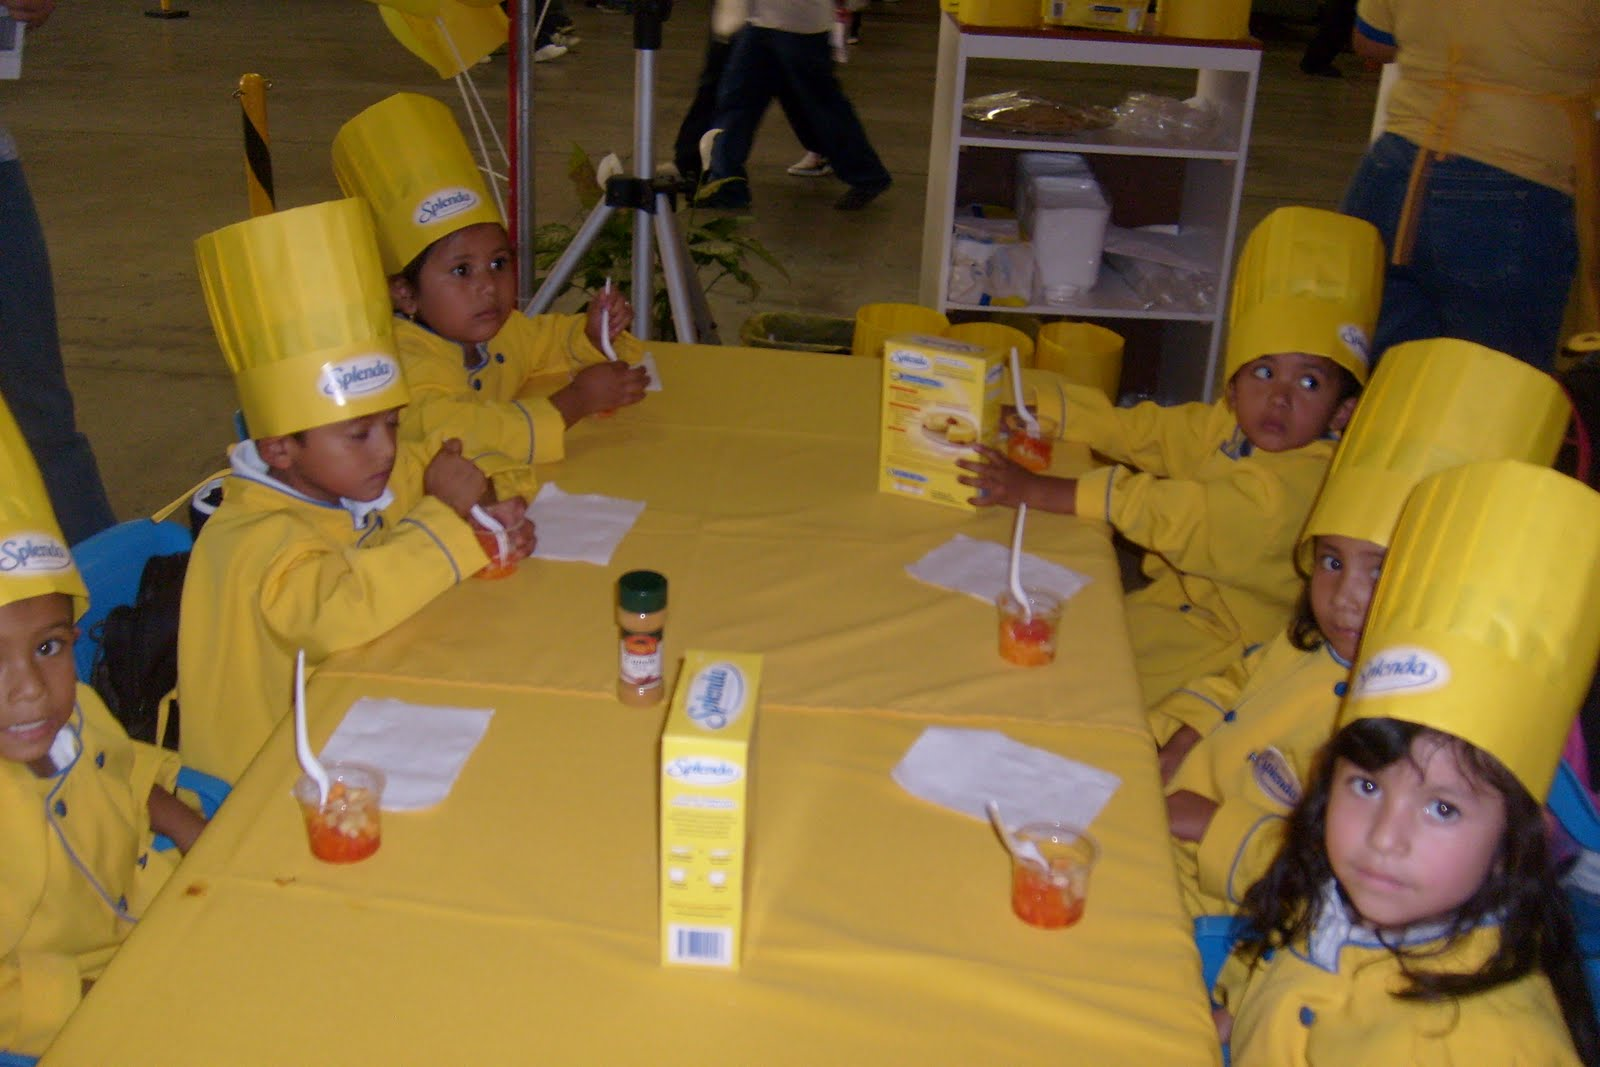 Jard n infantil biling e el club de mimmy micropolis 2010 for Aprendemos jugando jardin infantil